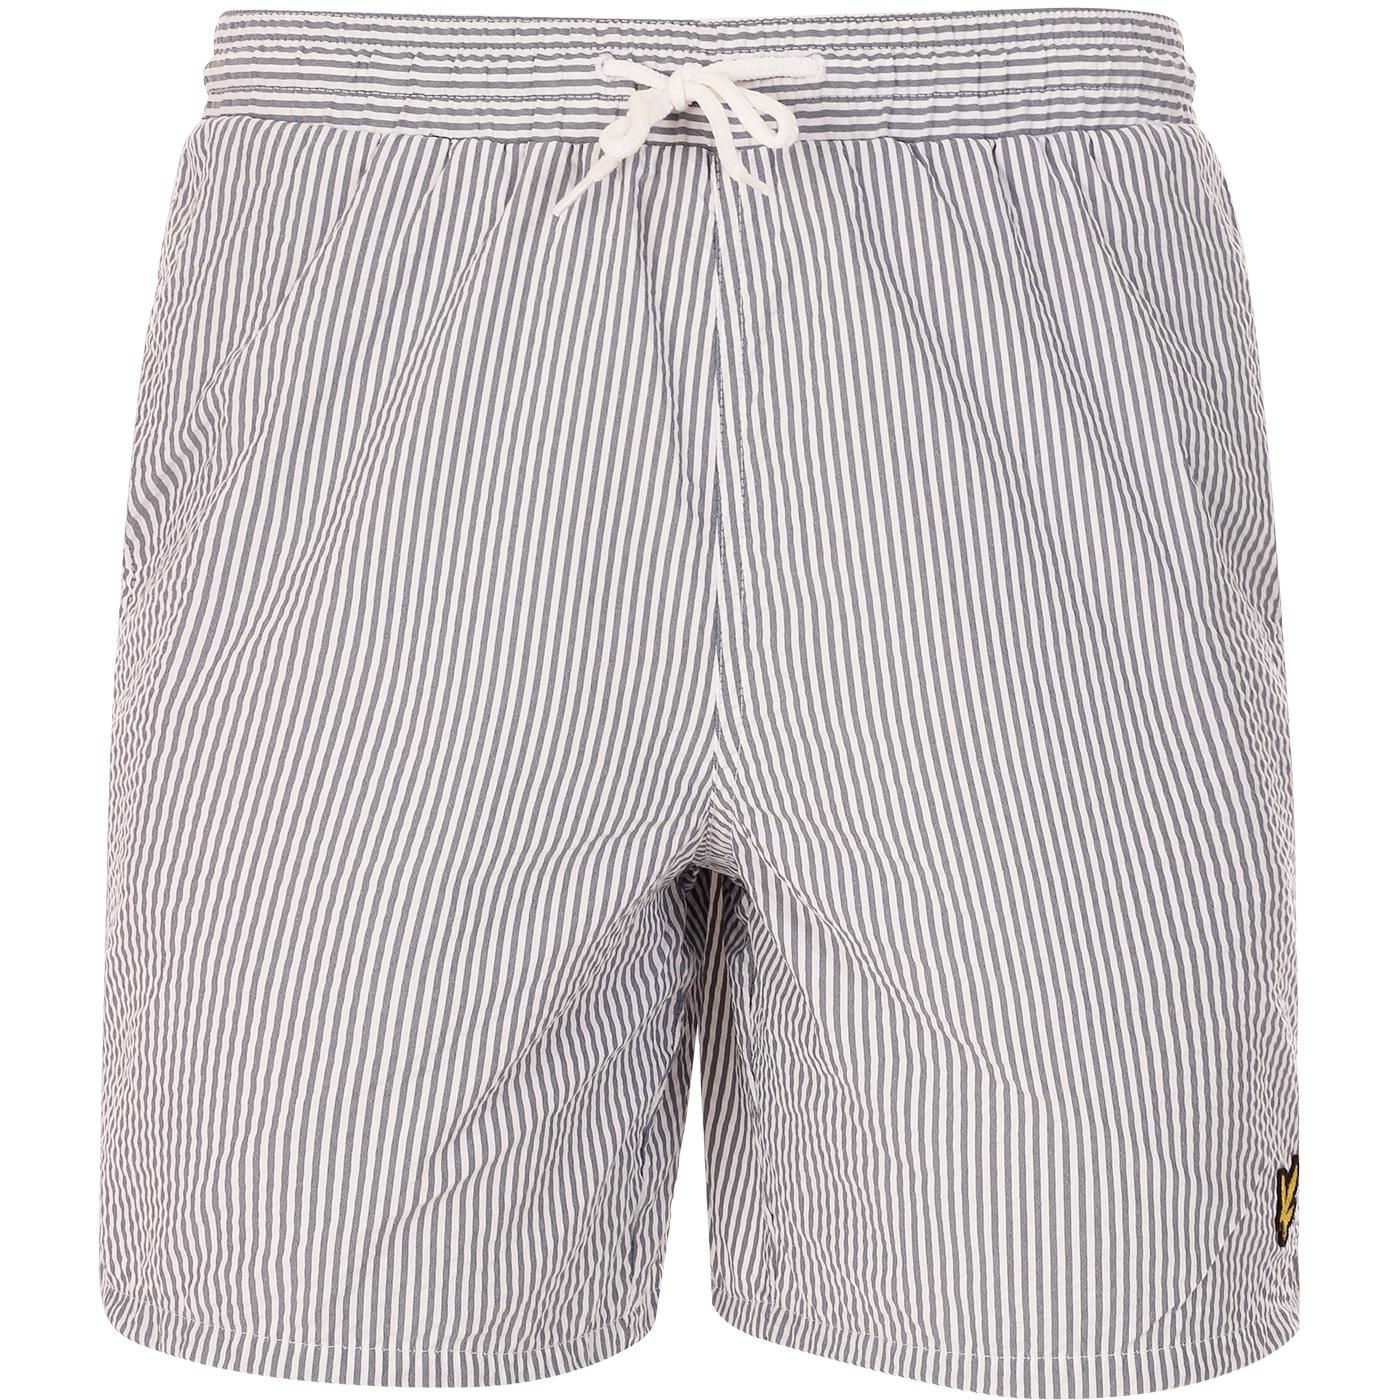 LYLE & SCOTT Retro Seersucker Stripe Swim Shorts